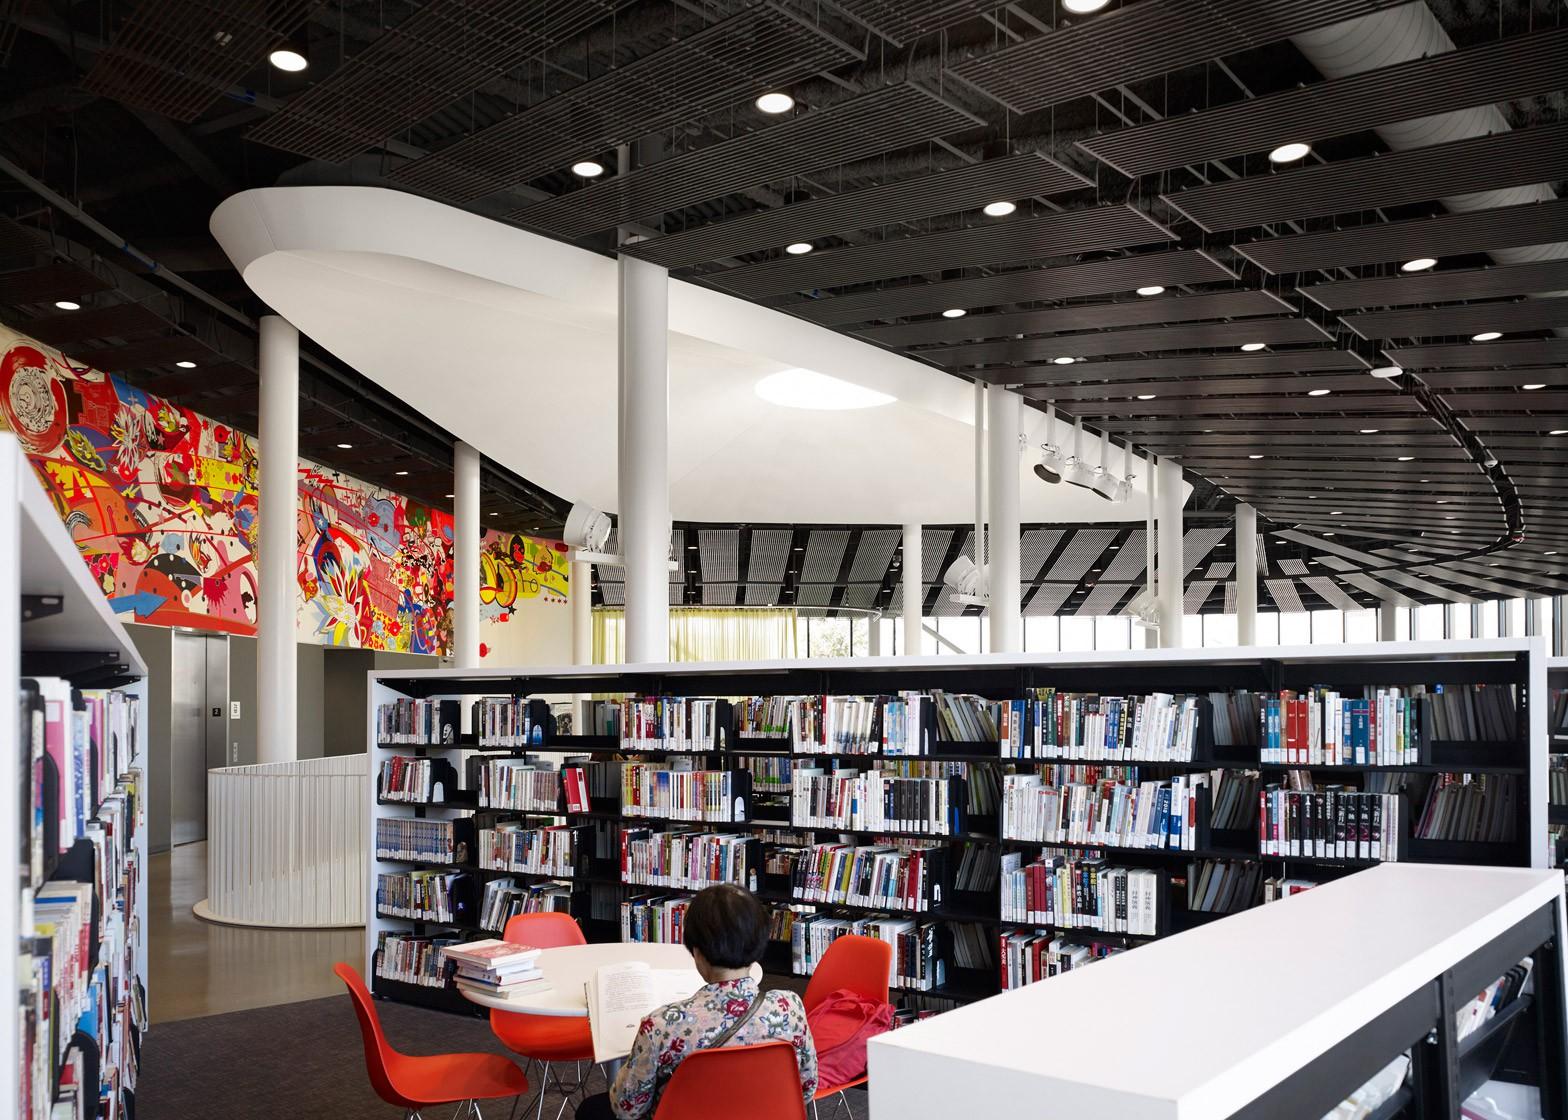 Public Library en Chinatown Branch (Chicago).